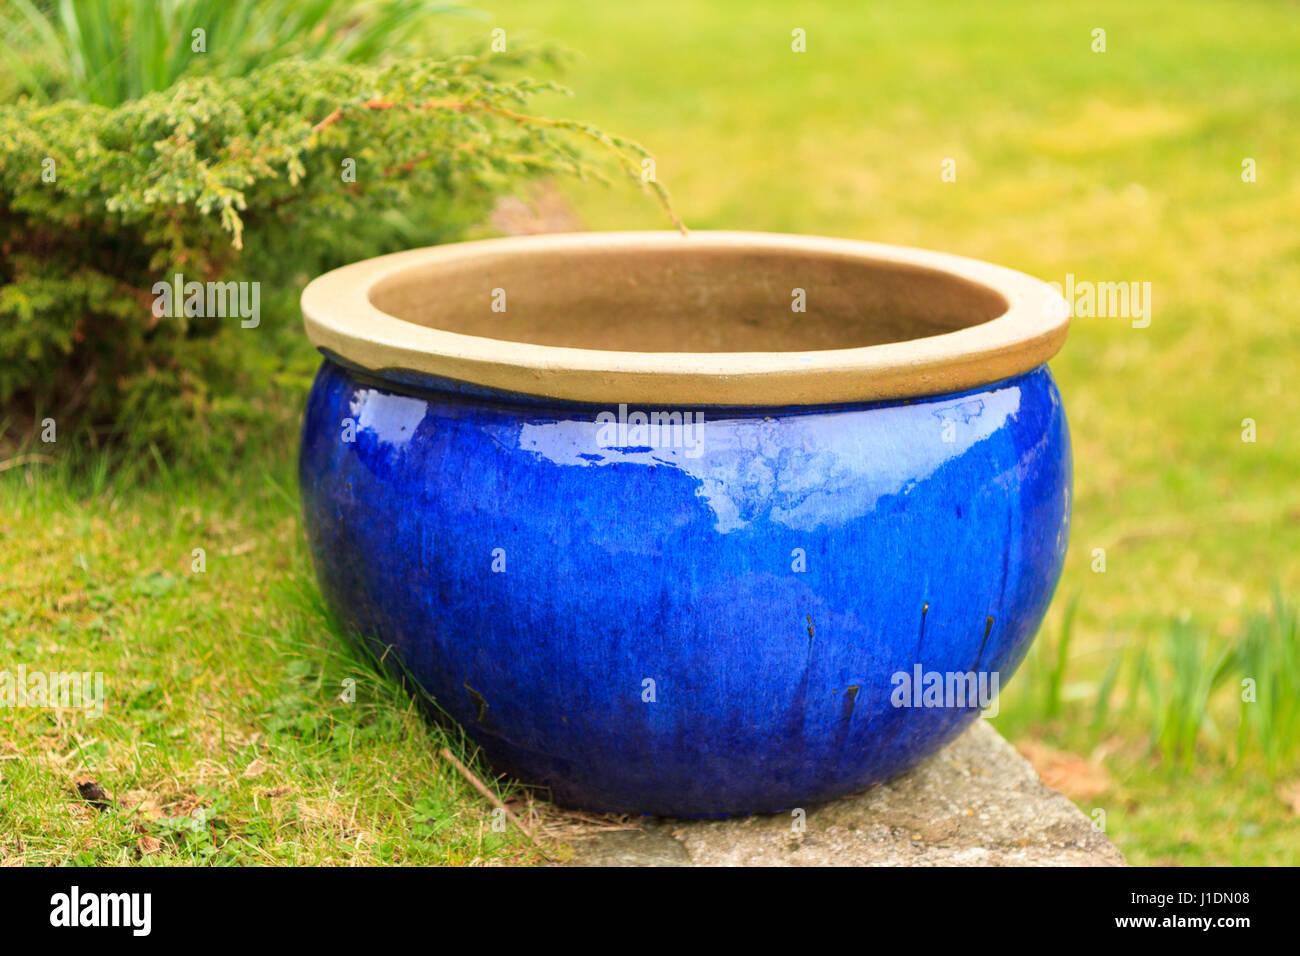 Merveilleux Big Blue Ceramic Glazed Outdoor Garden Pot   Stock Image